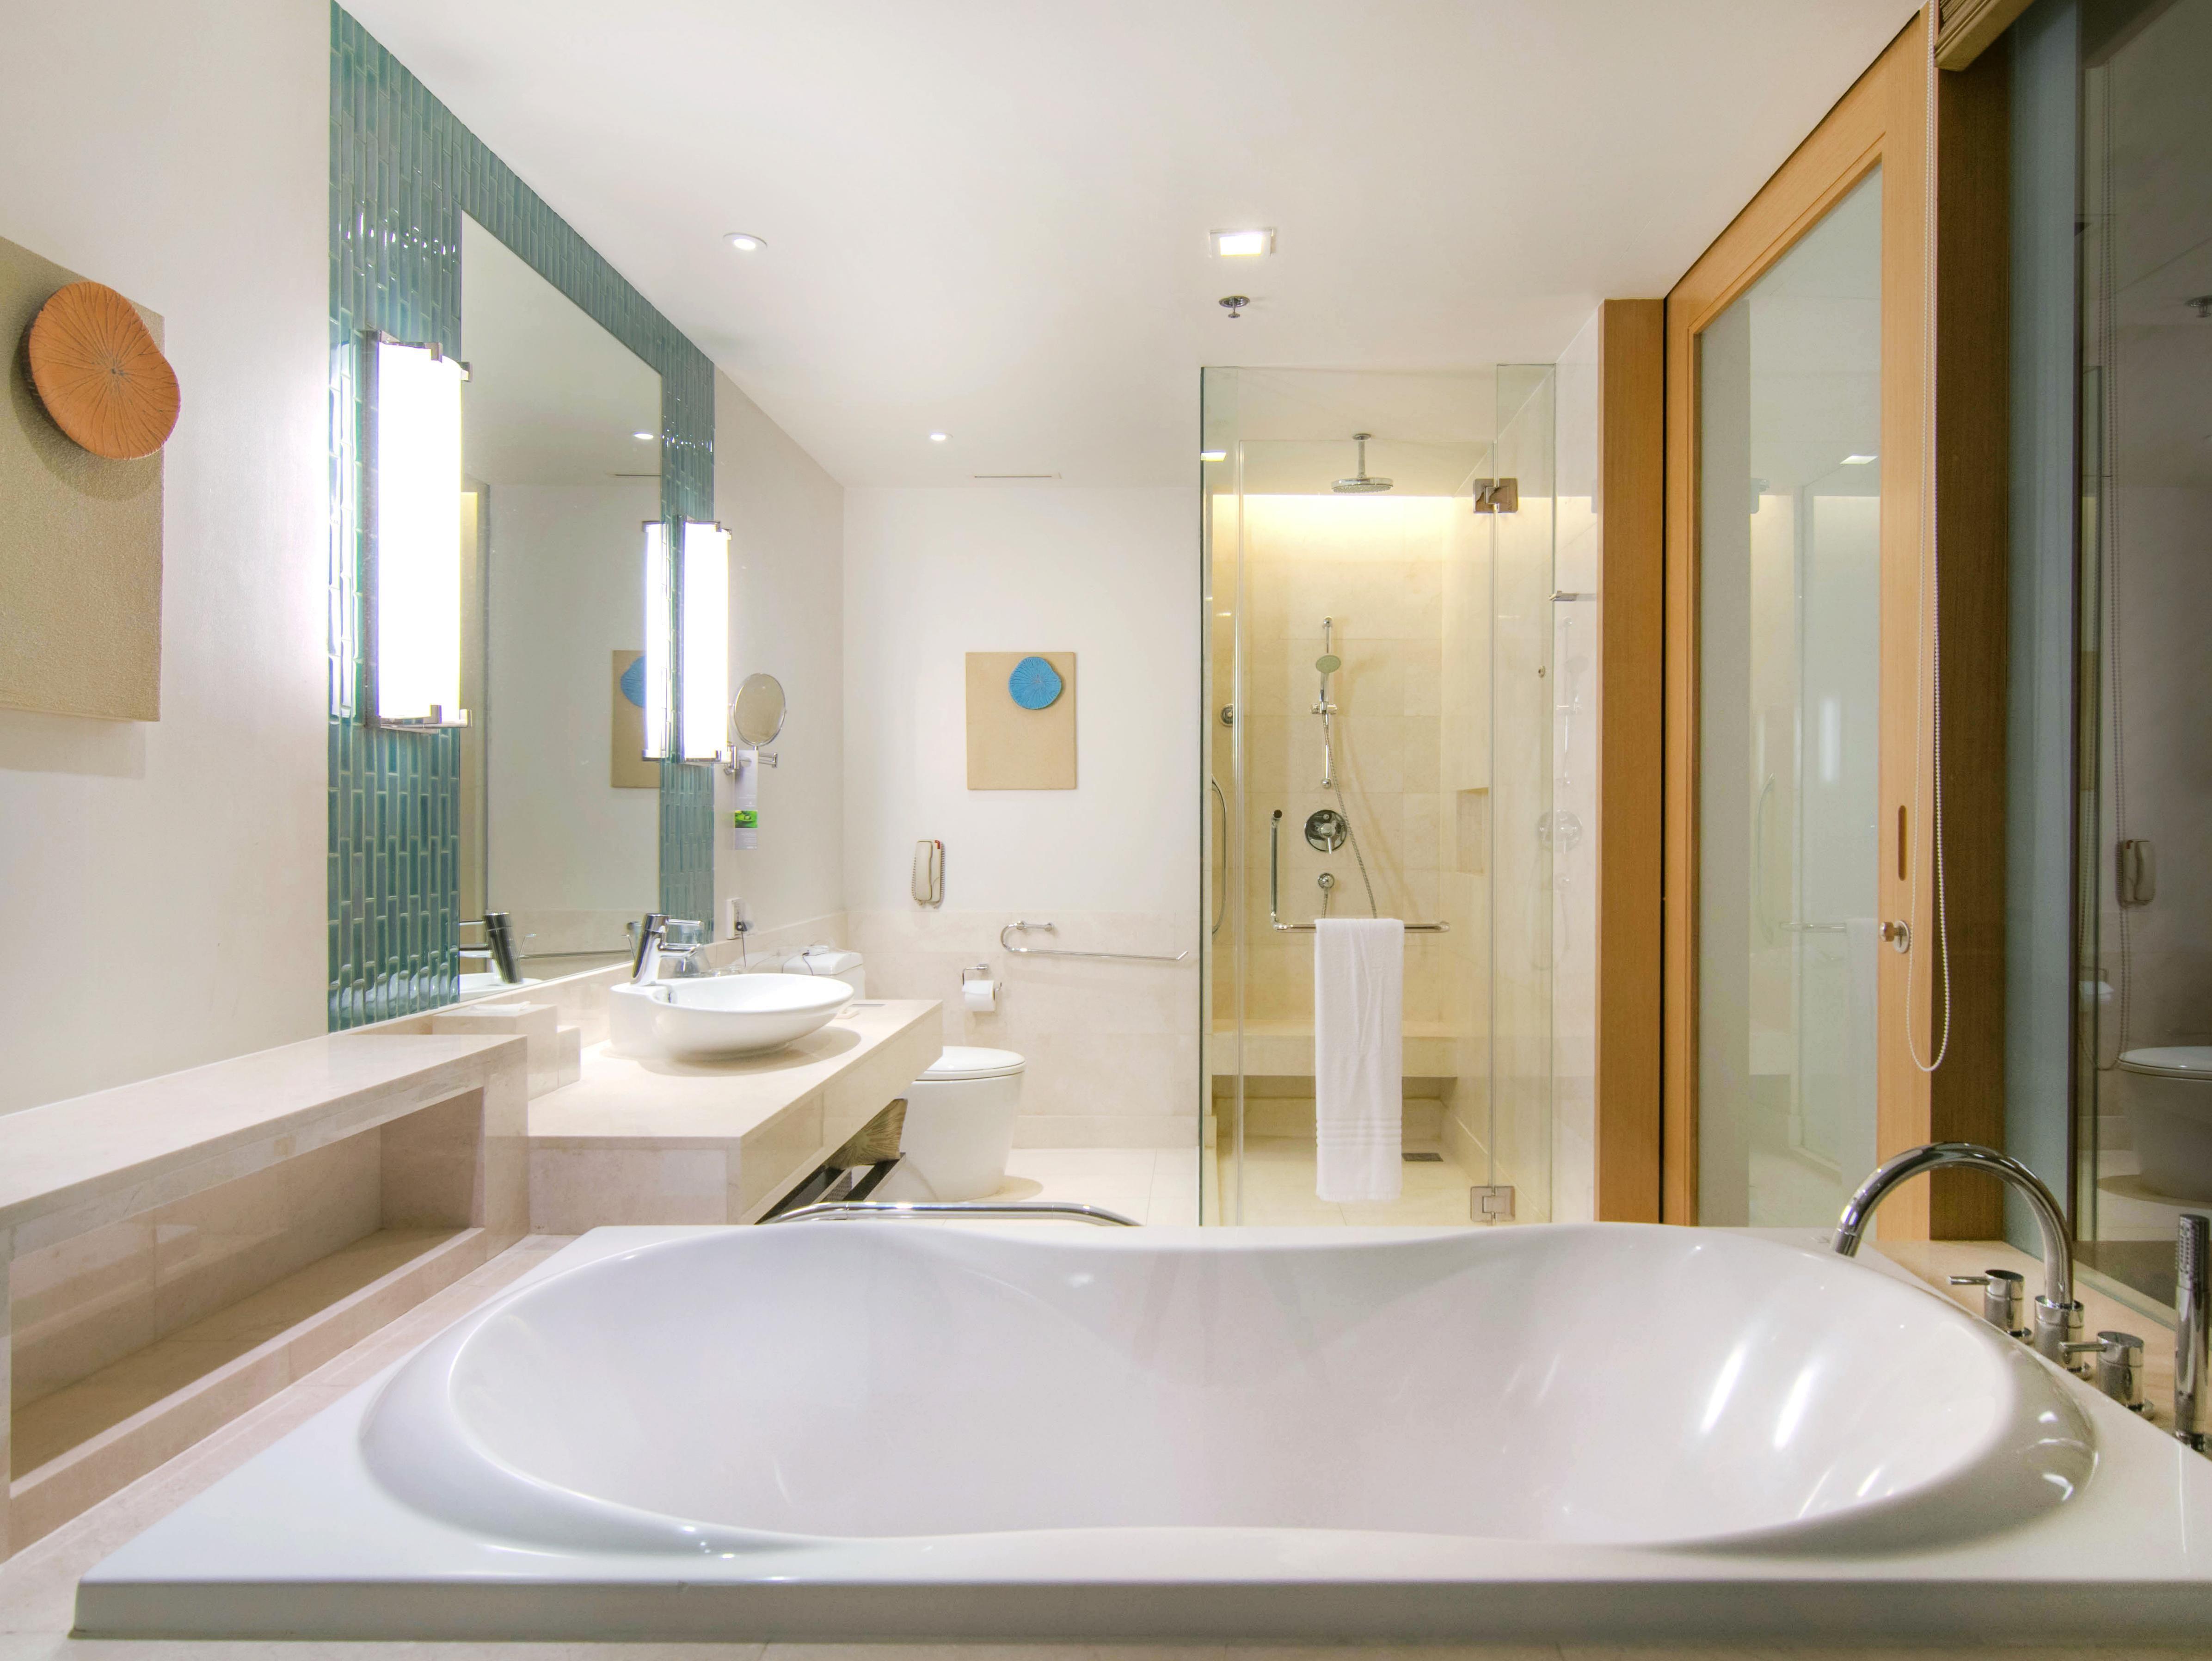 Renaissance Phuket Resort & Spa A Marriott Luxury & Lifestyle Hotel Phuket, Thailand